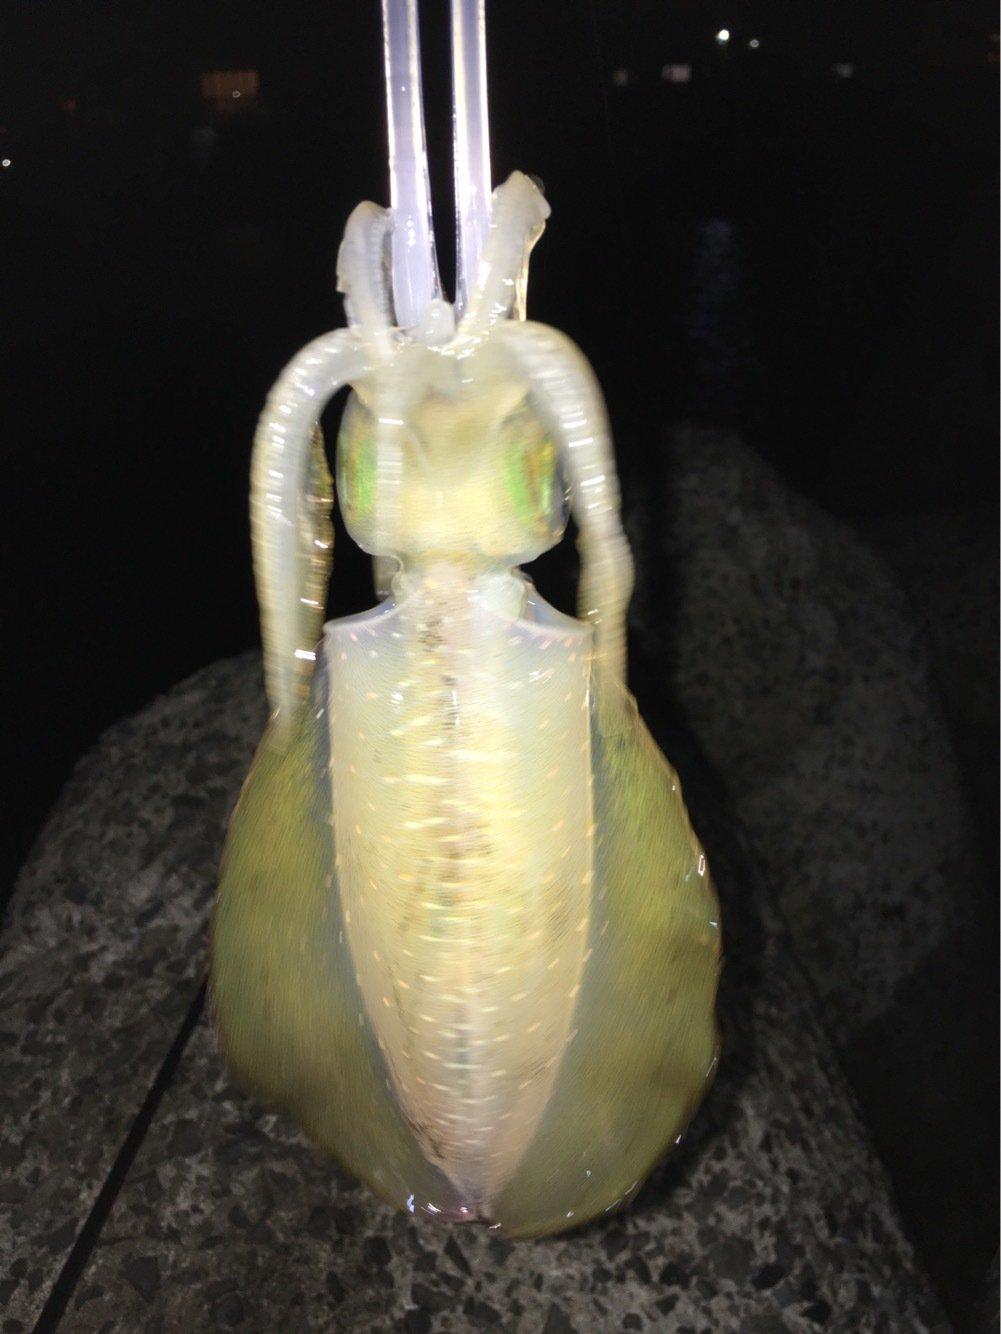 SHOHEYさんの投稿画像,写っている魚はアオリイカ